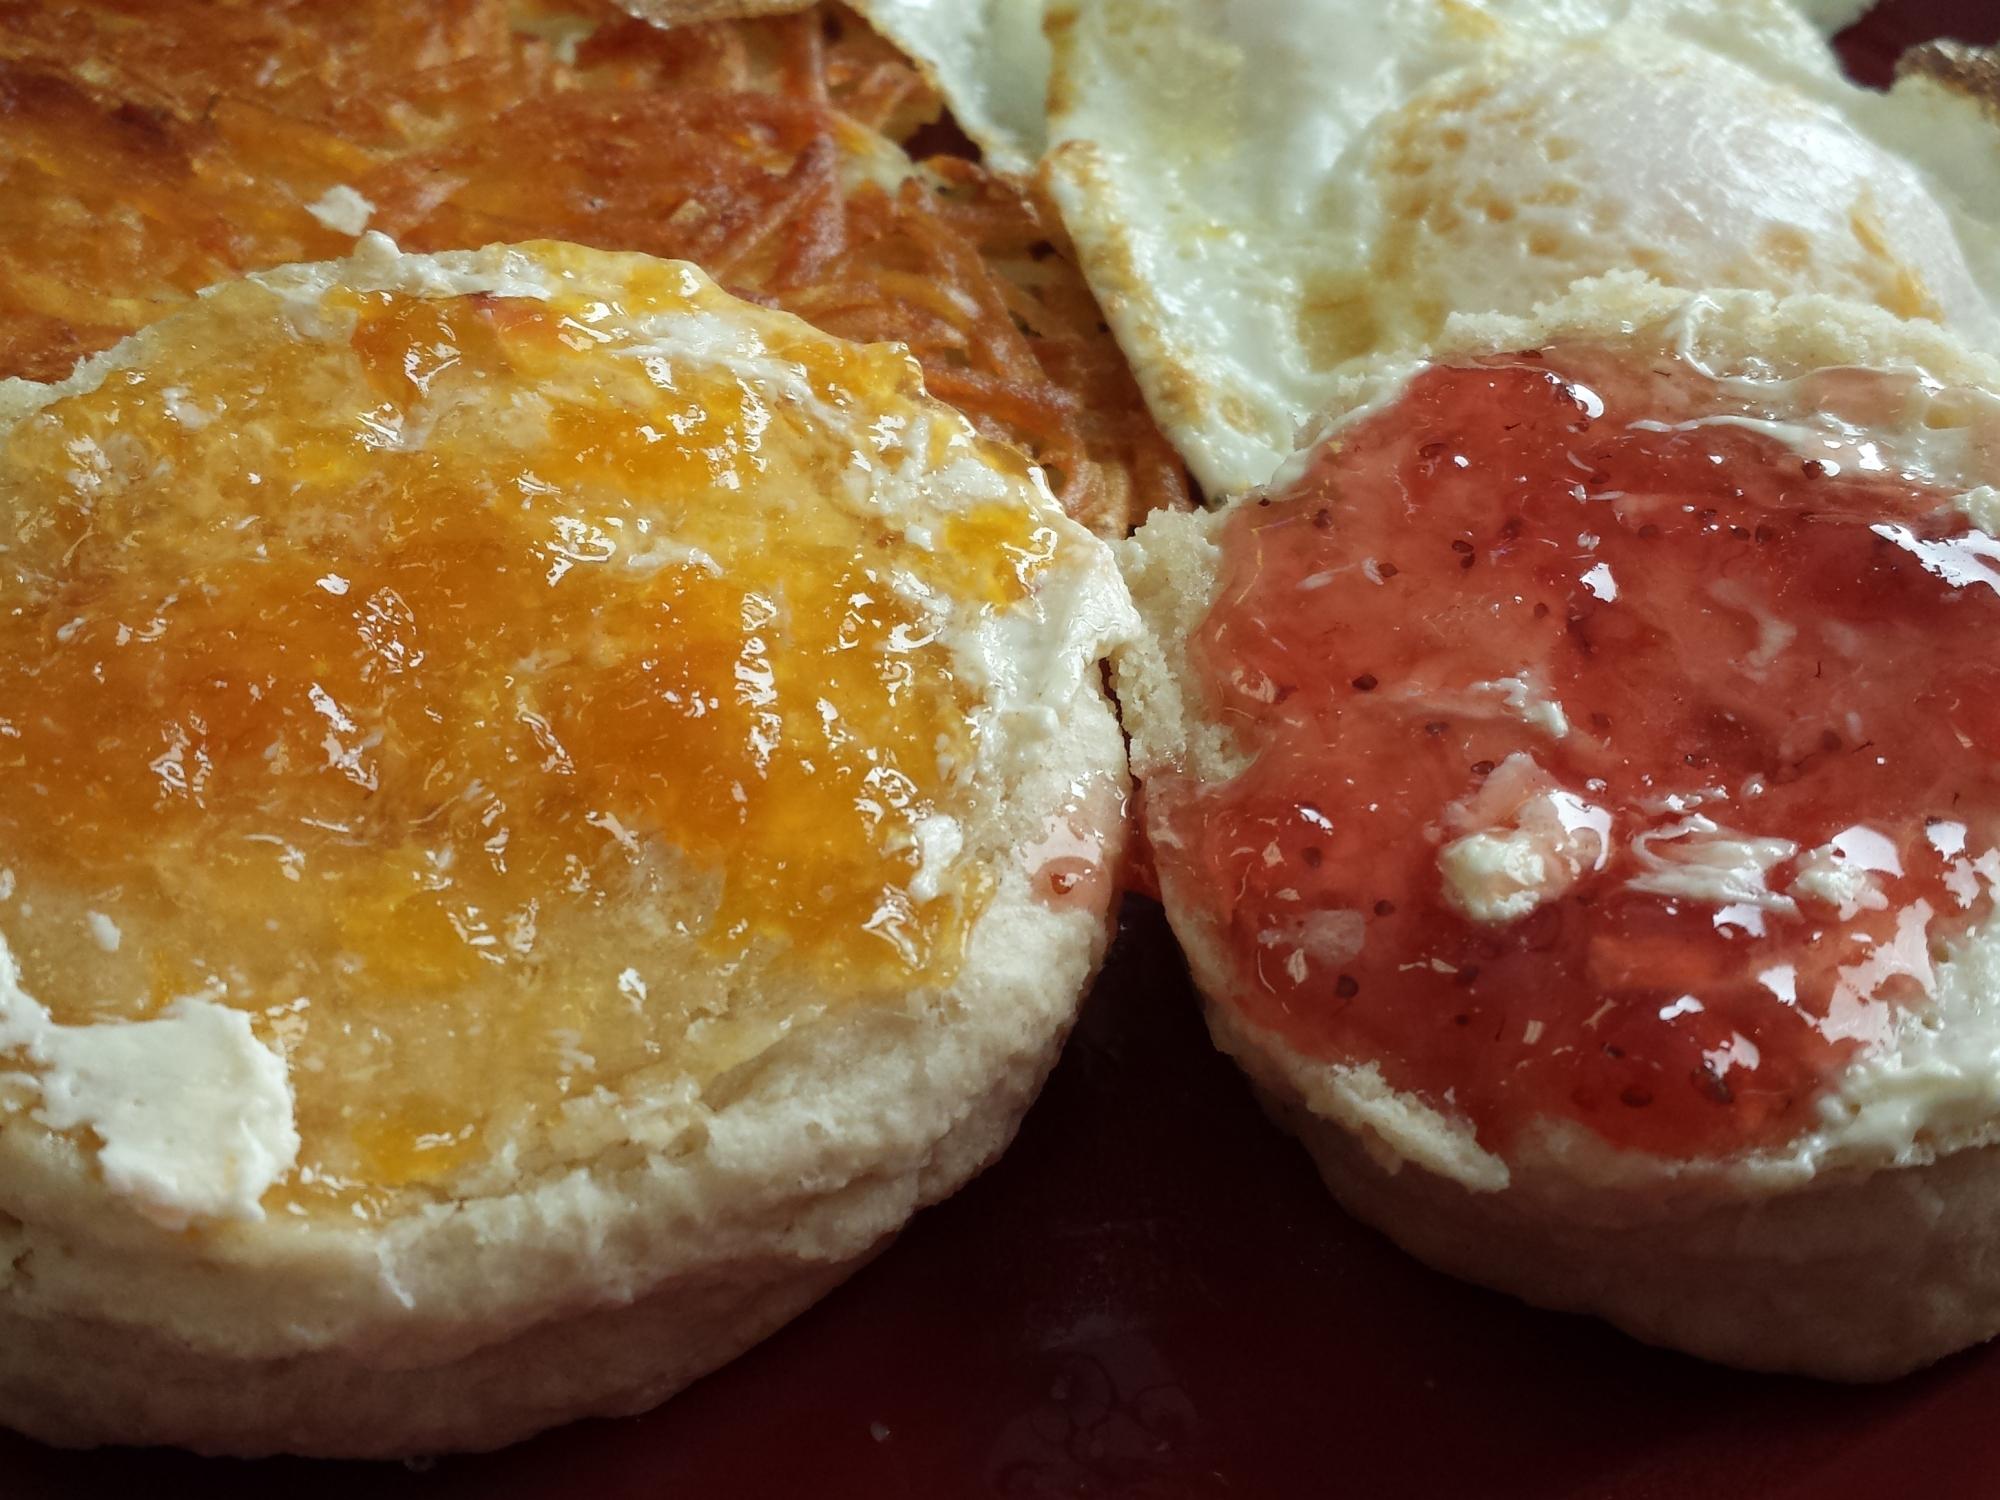 perkupcafe biscuits housemade jam urbandale iowa morethanafoodie